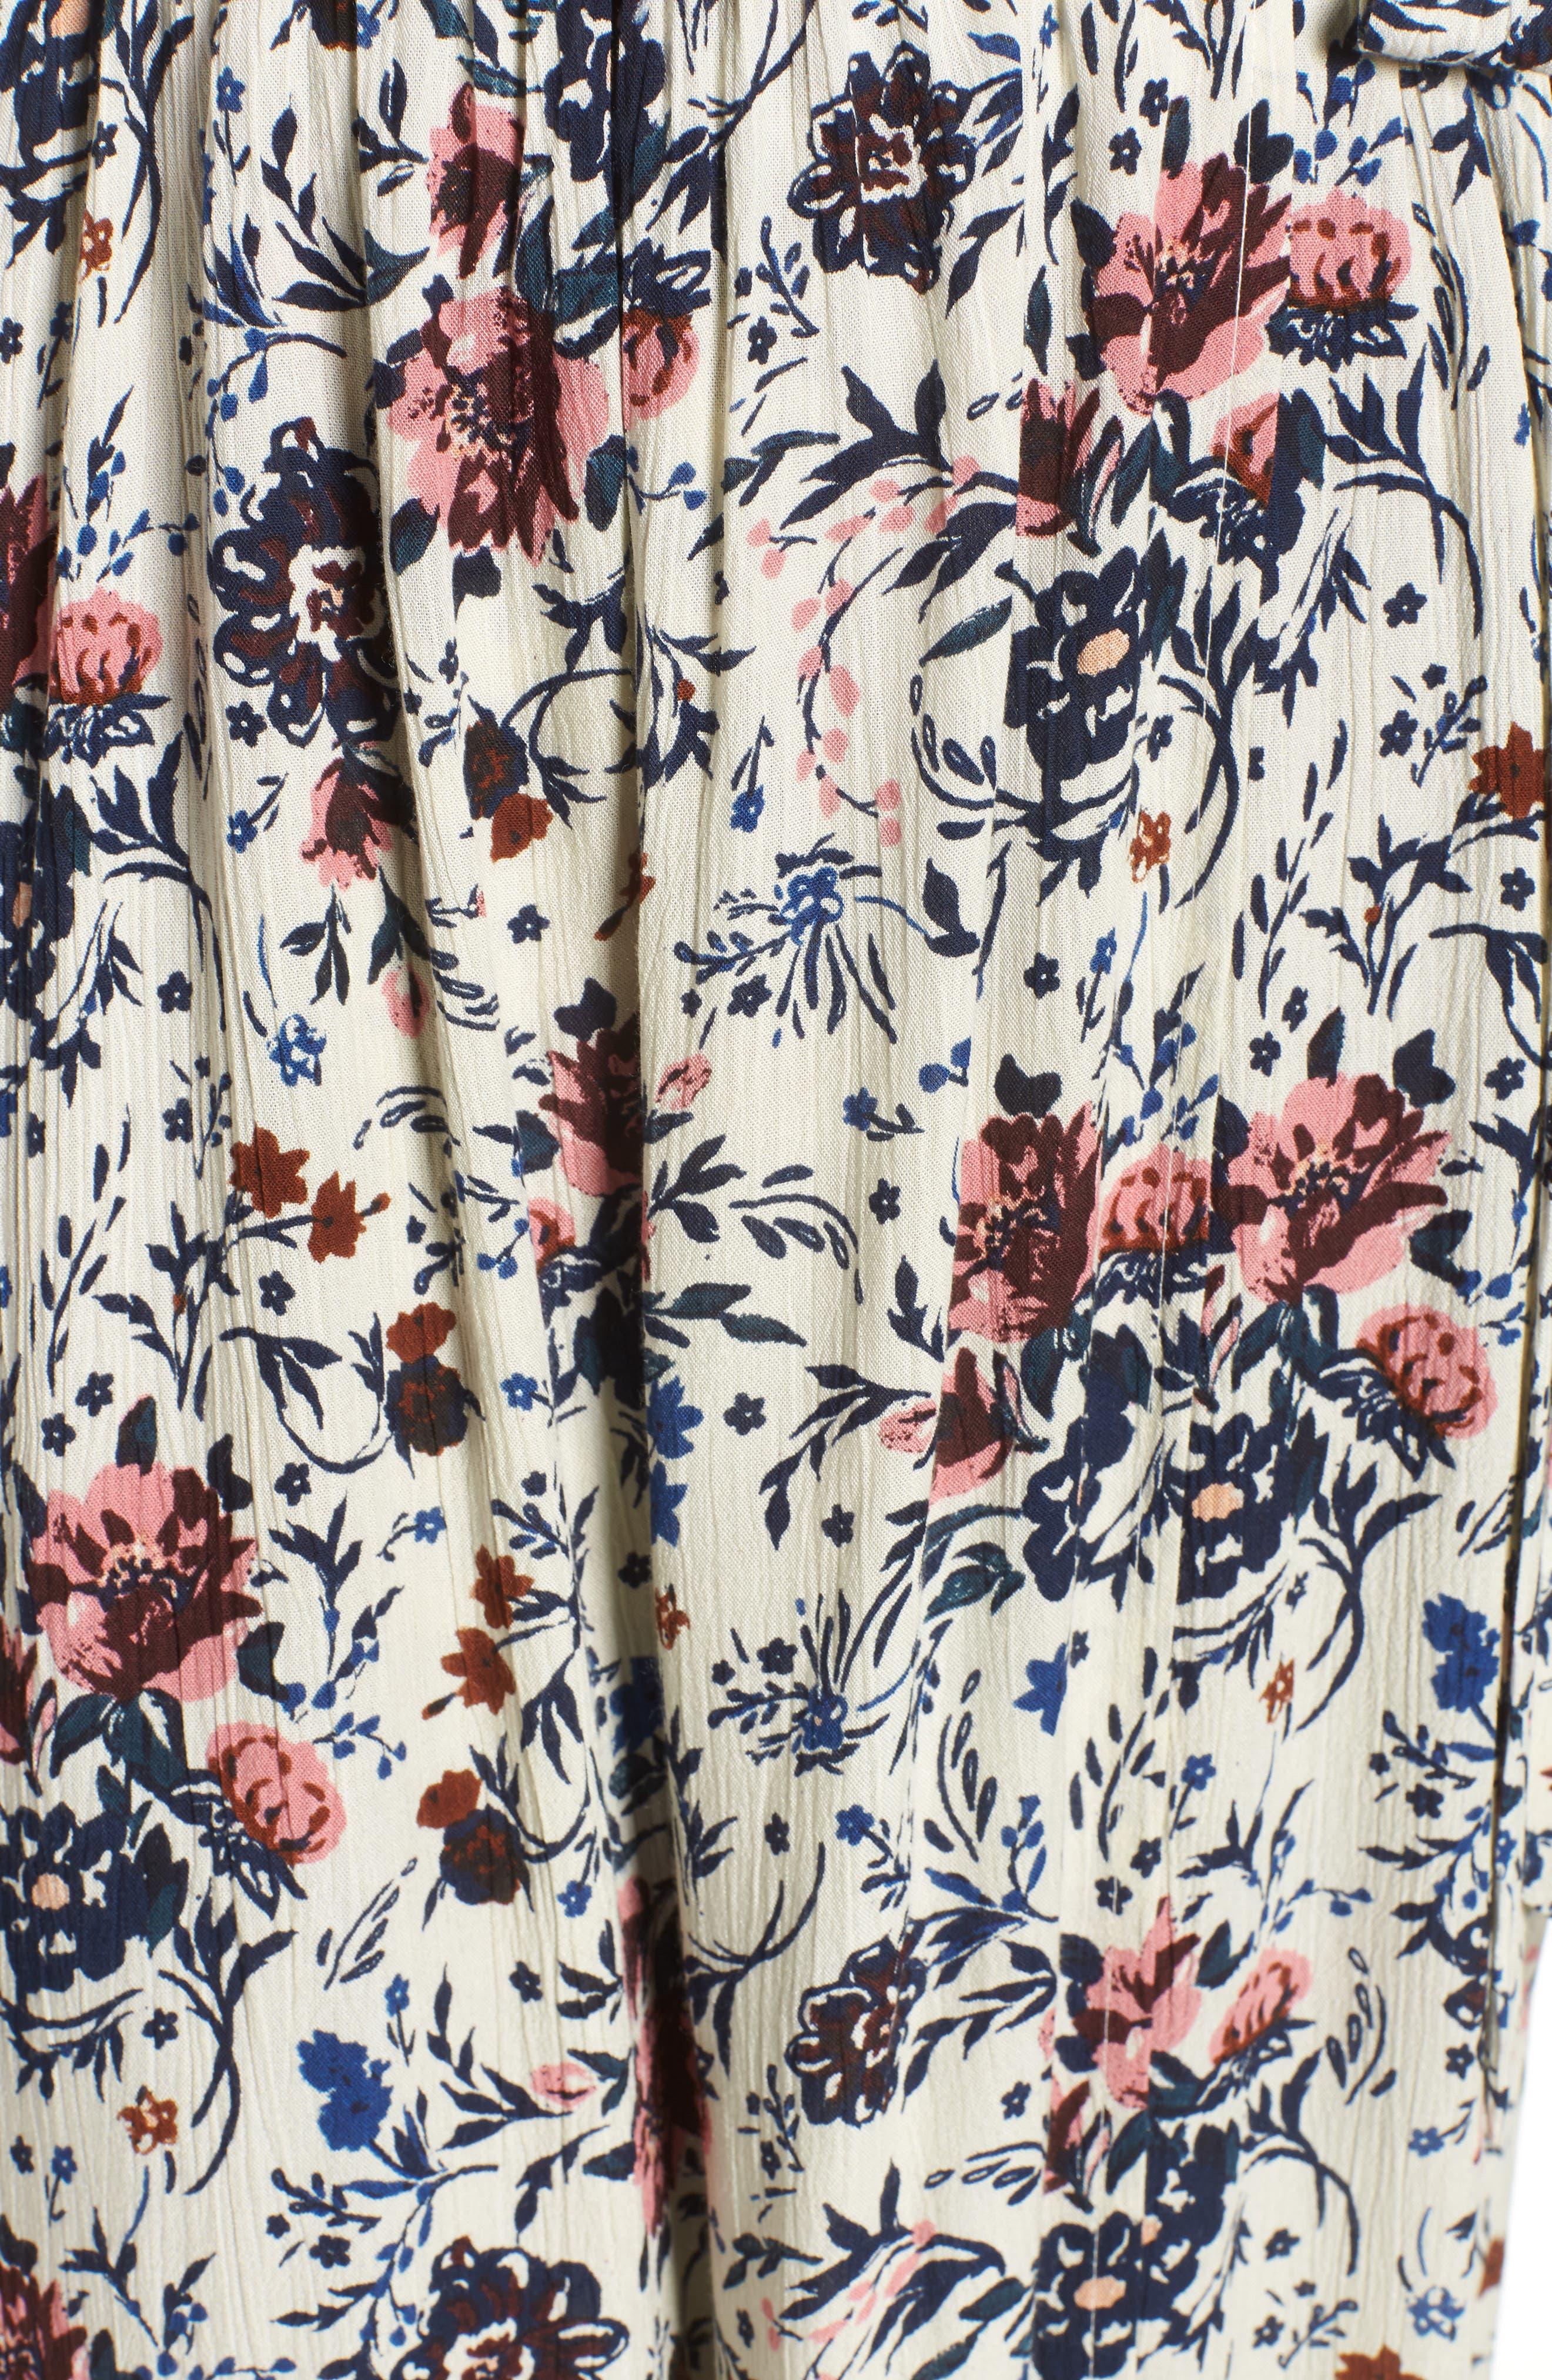 Floral Maxi Dress,                             Alternate thumbnail 3, color,                             Ivory Floral